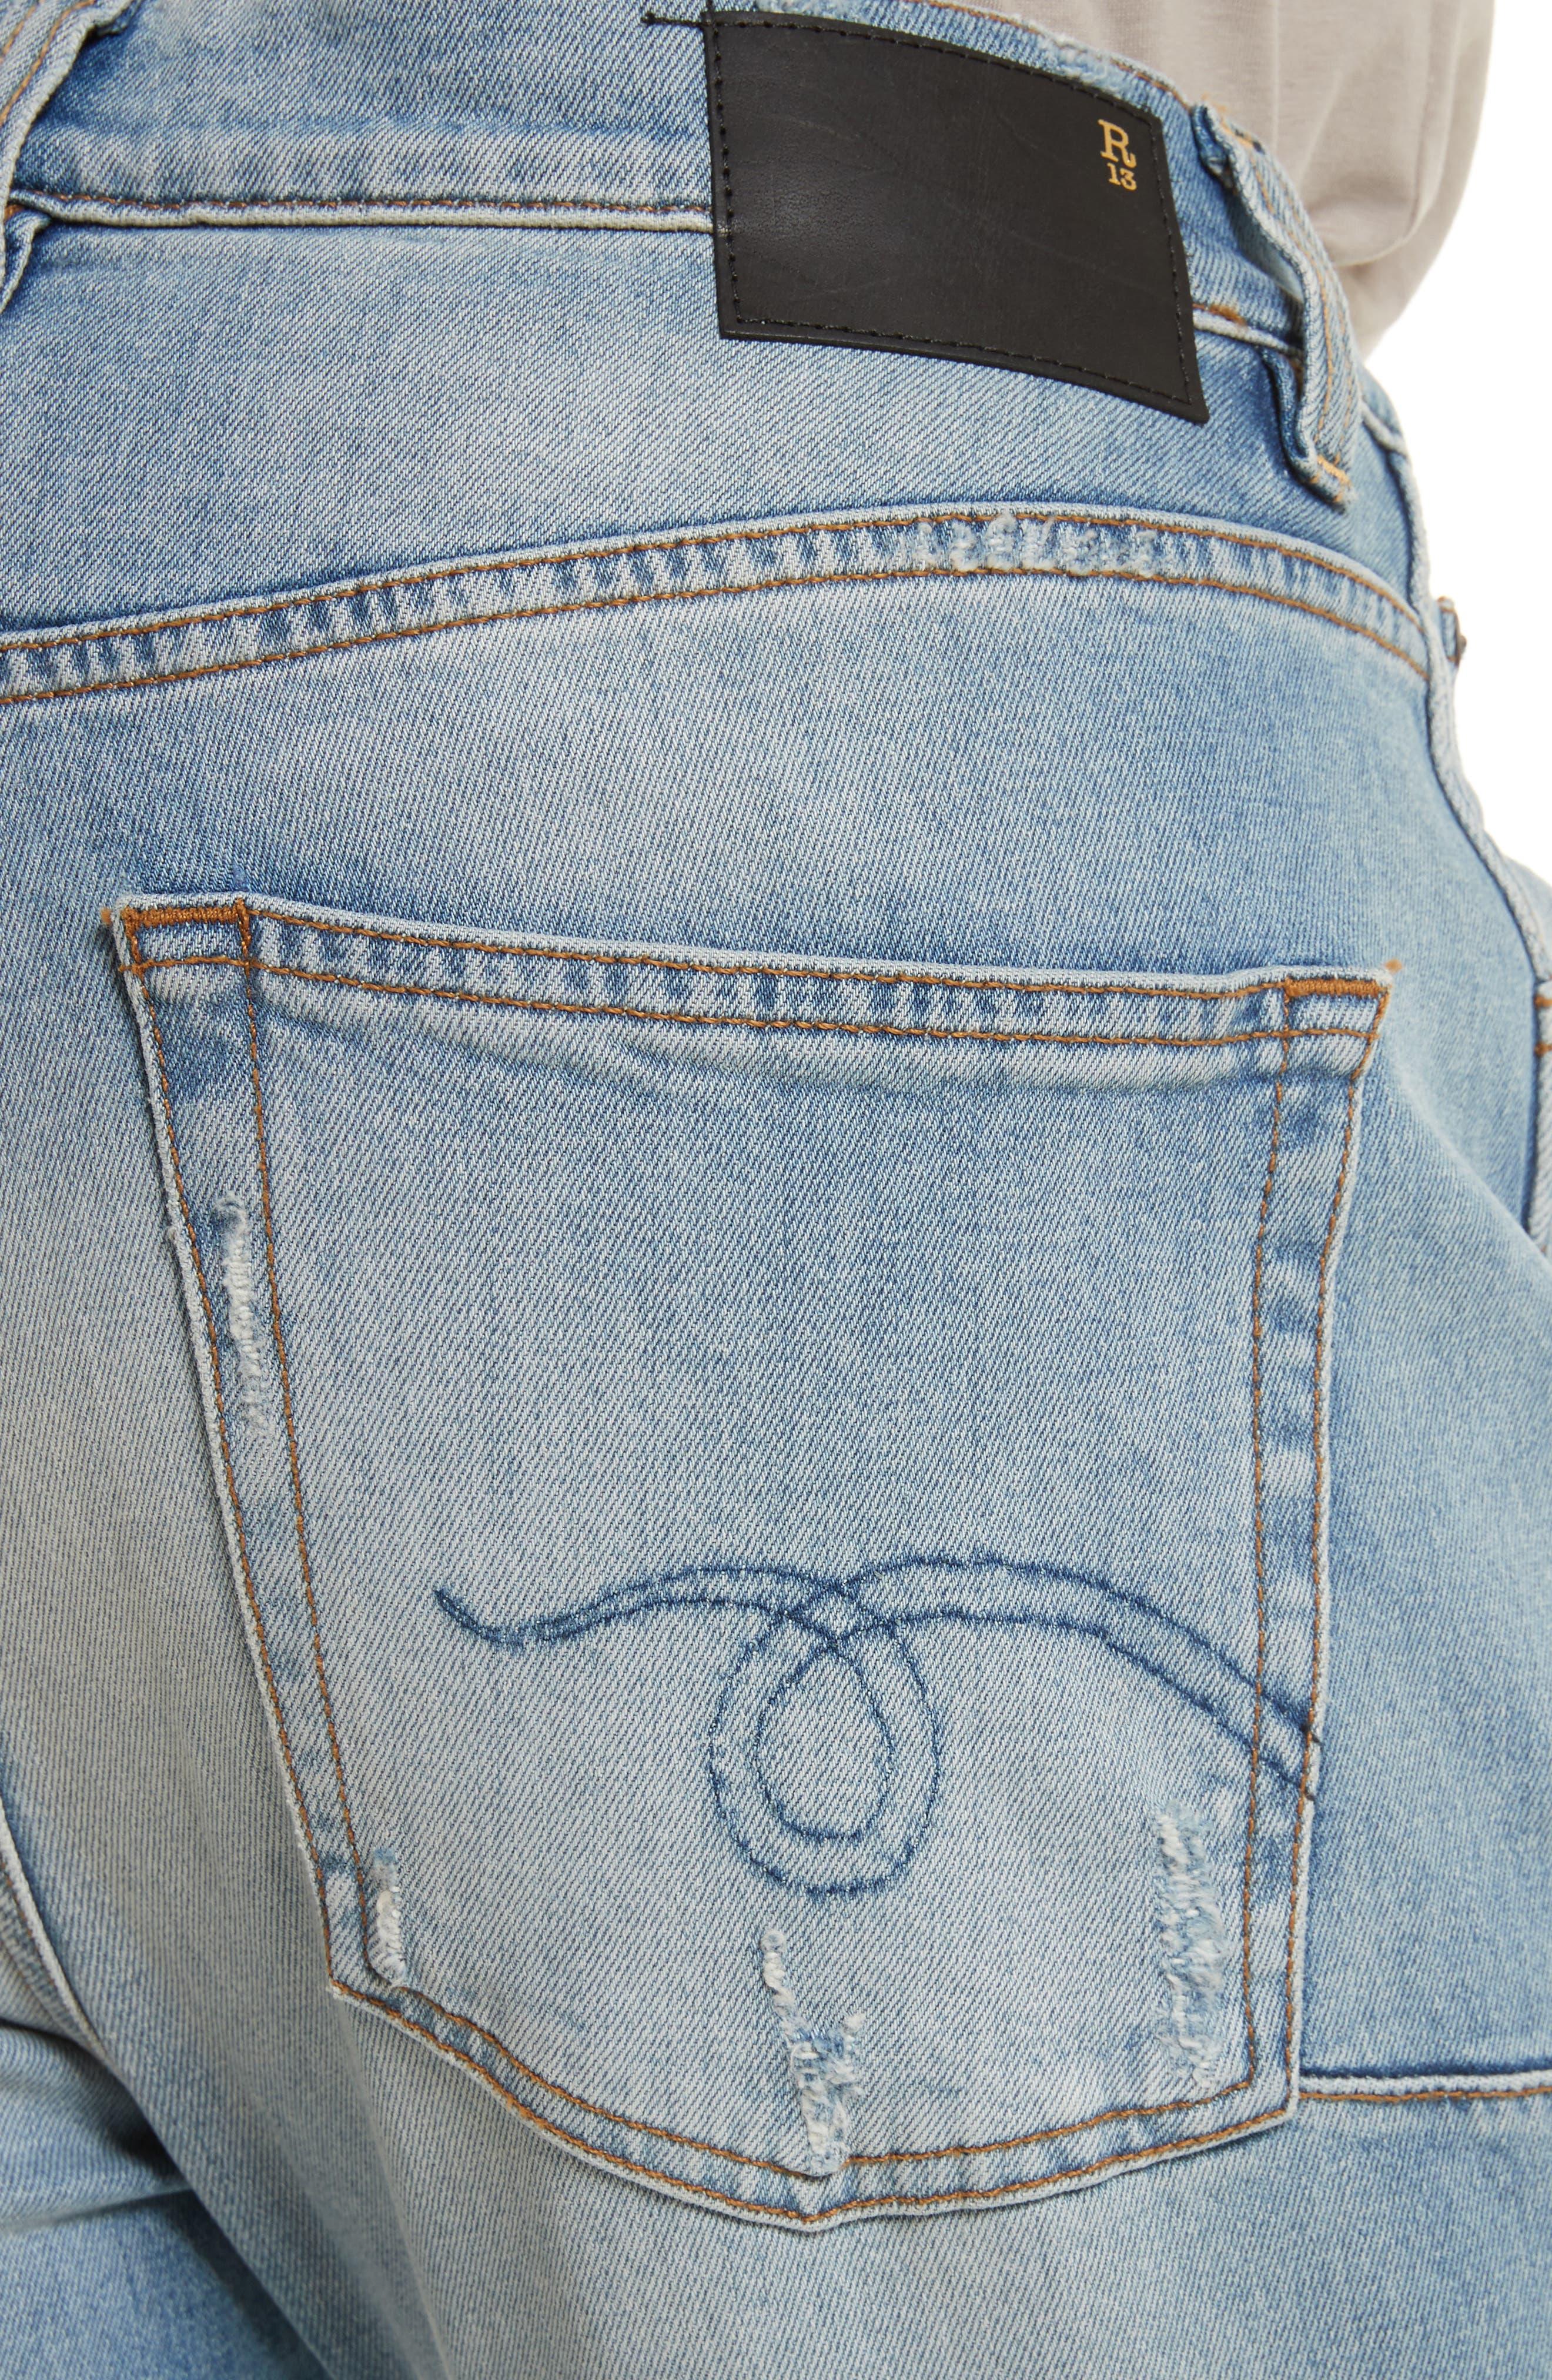 Alternate Image 4  - R13 Deacon Skate Skinny Fit Jeans